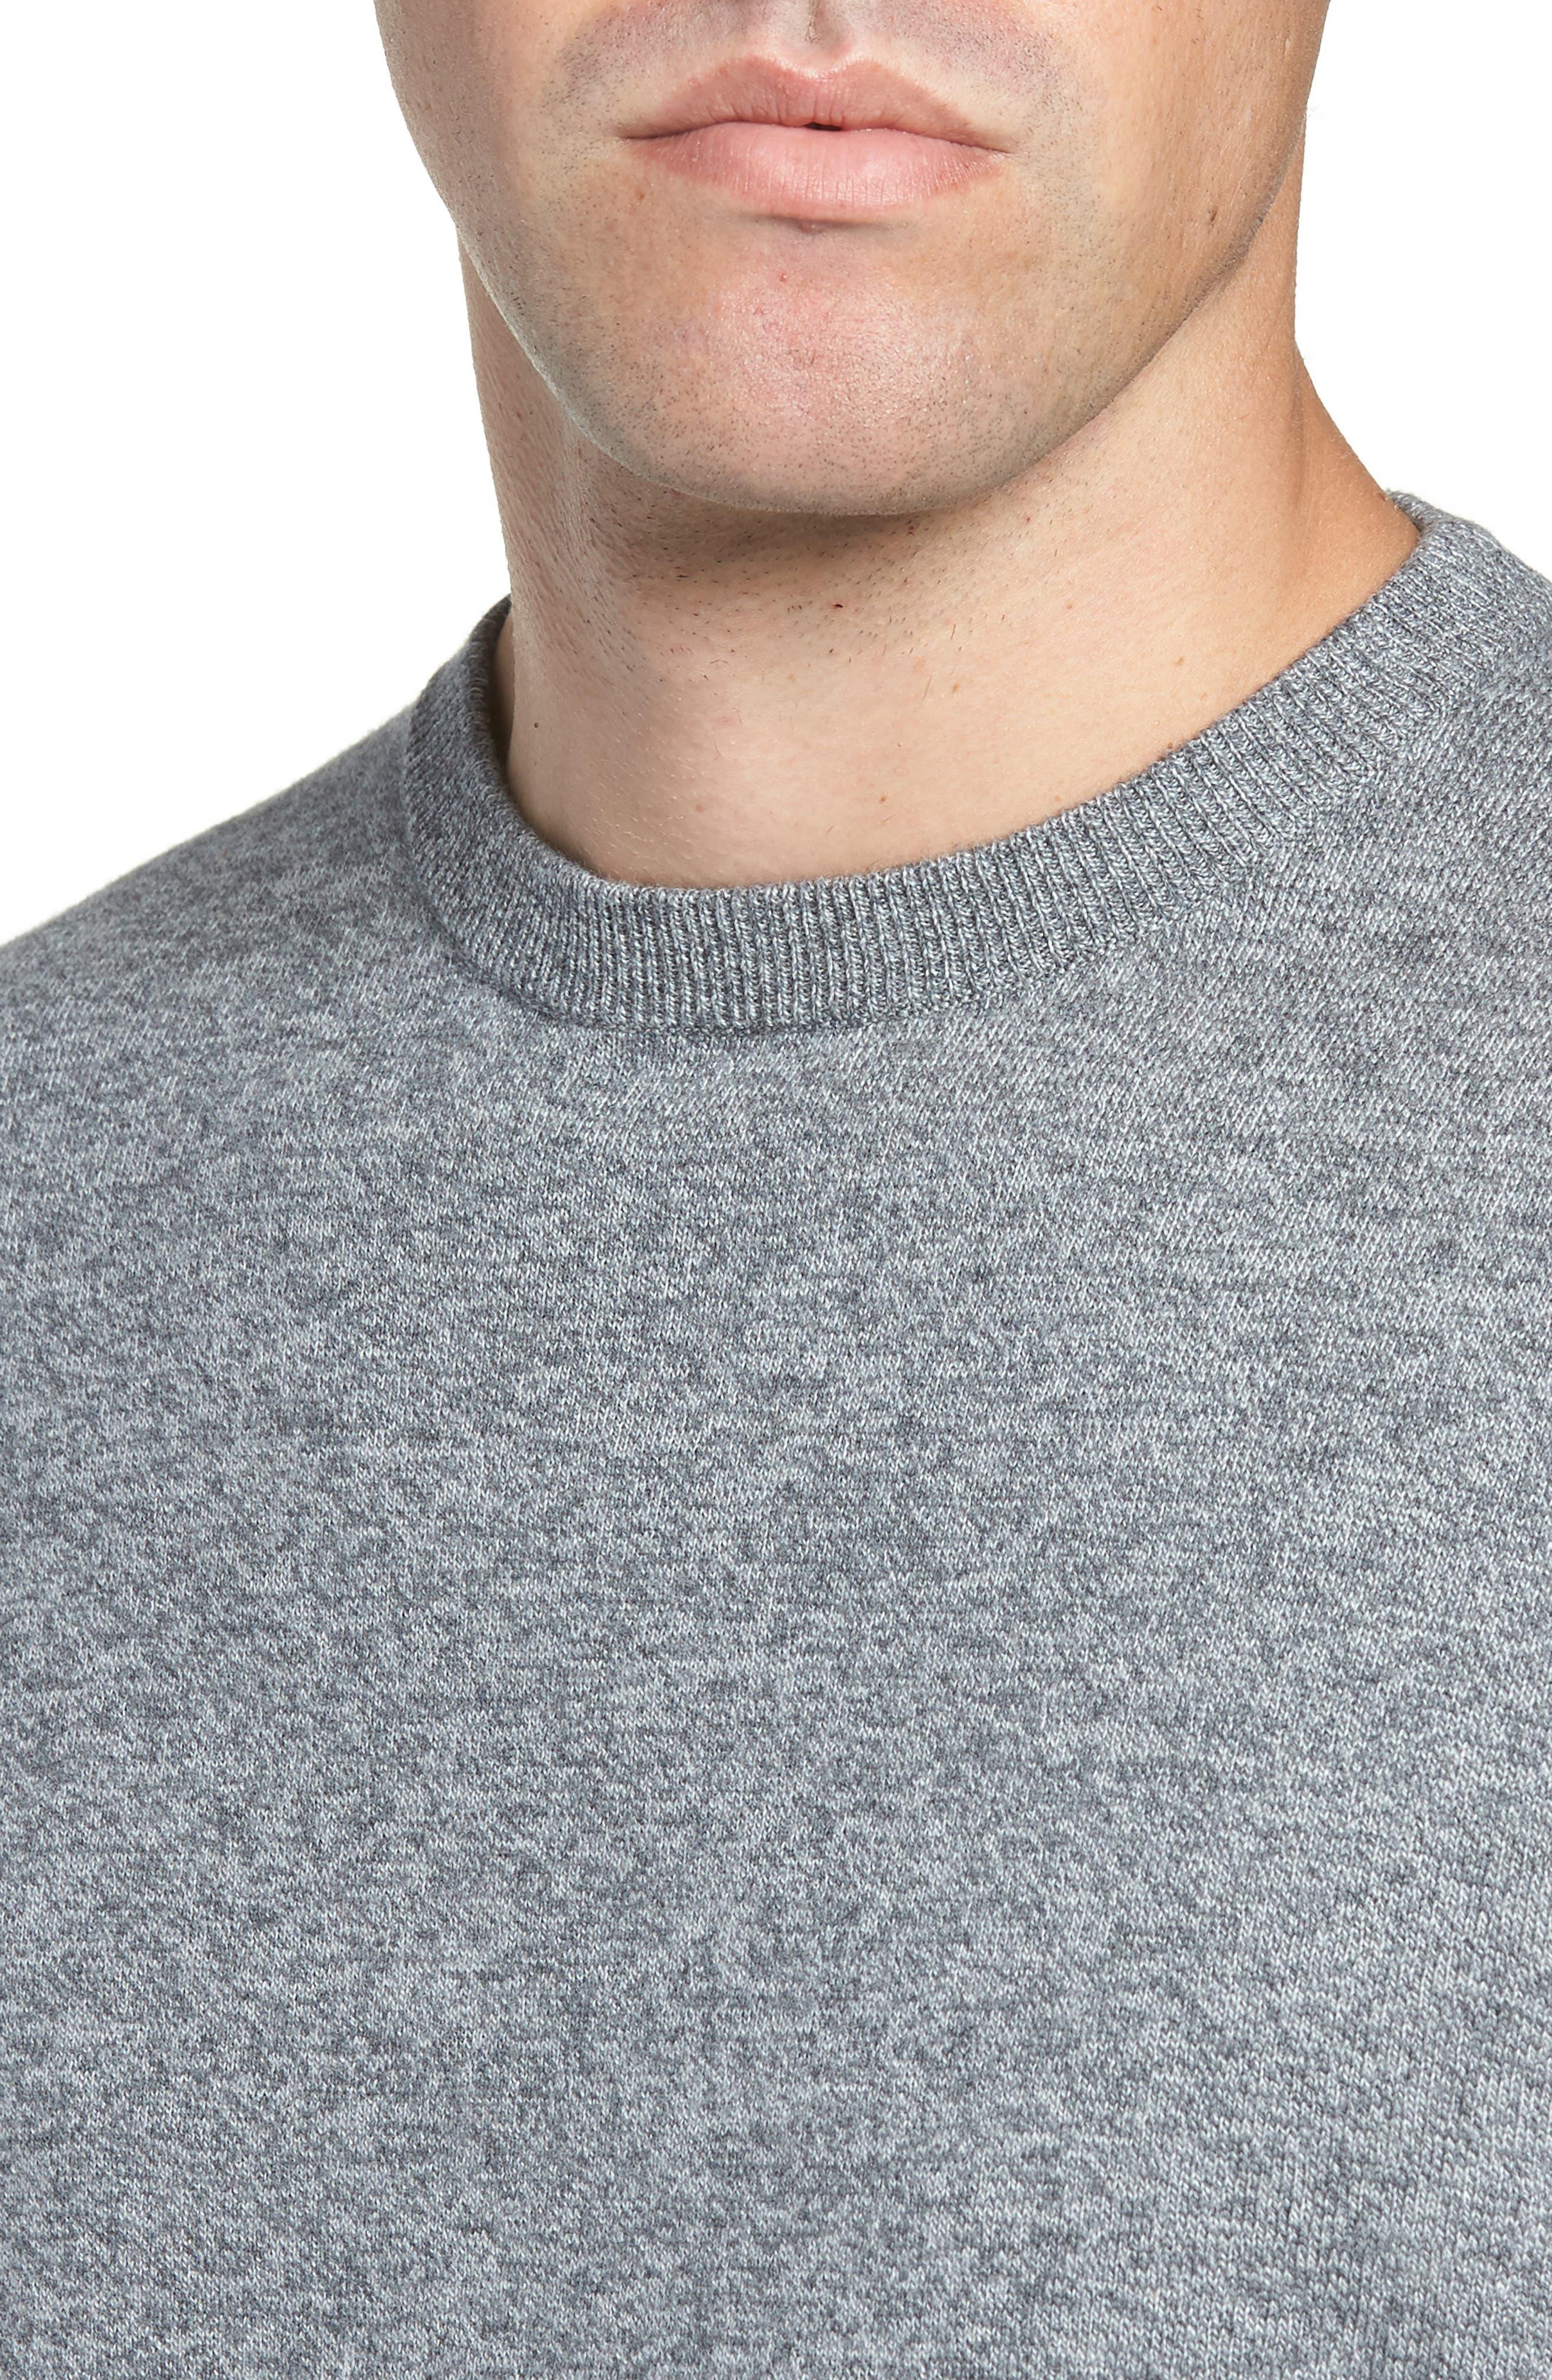 NORDSTROM MEN'S SHOP, Cotton & Cashmere Crewneck Sweater, Alternate thumbnail 4, color, GREY SHADE MARL